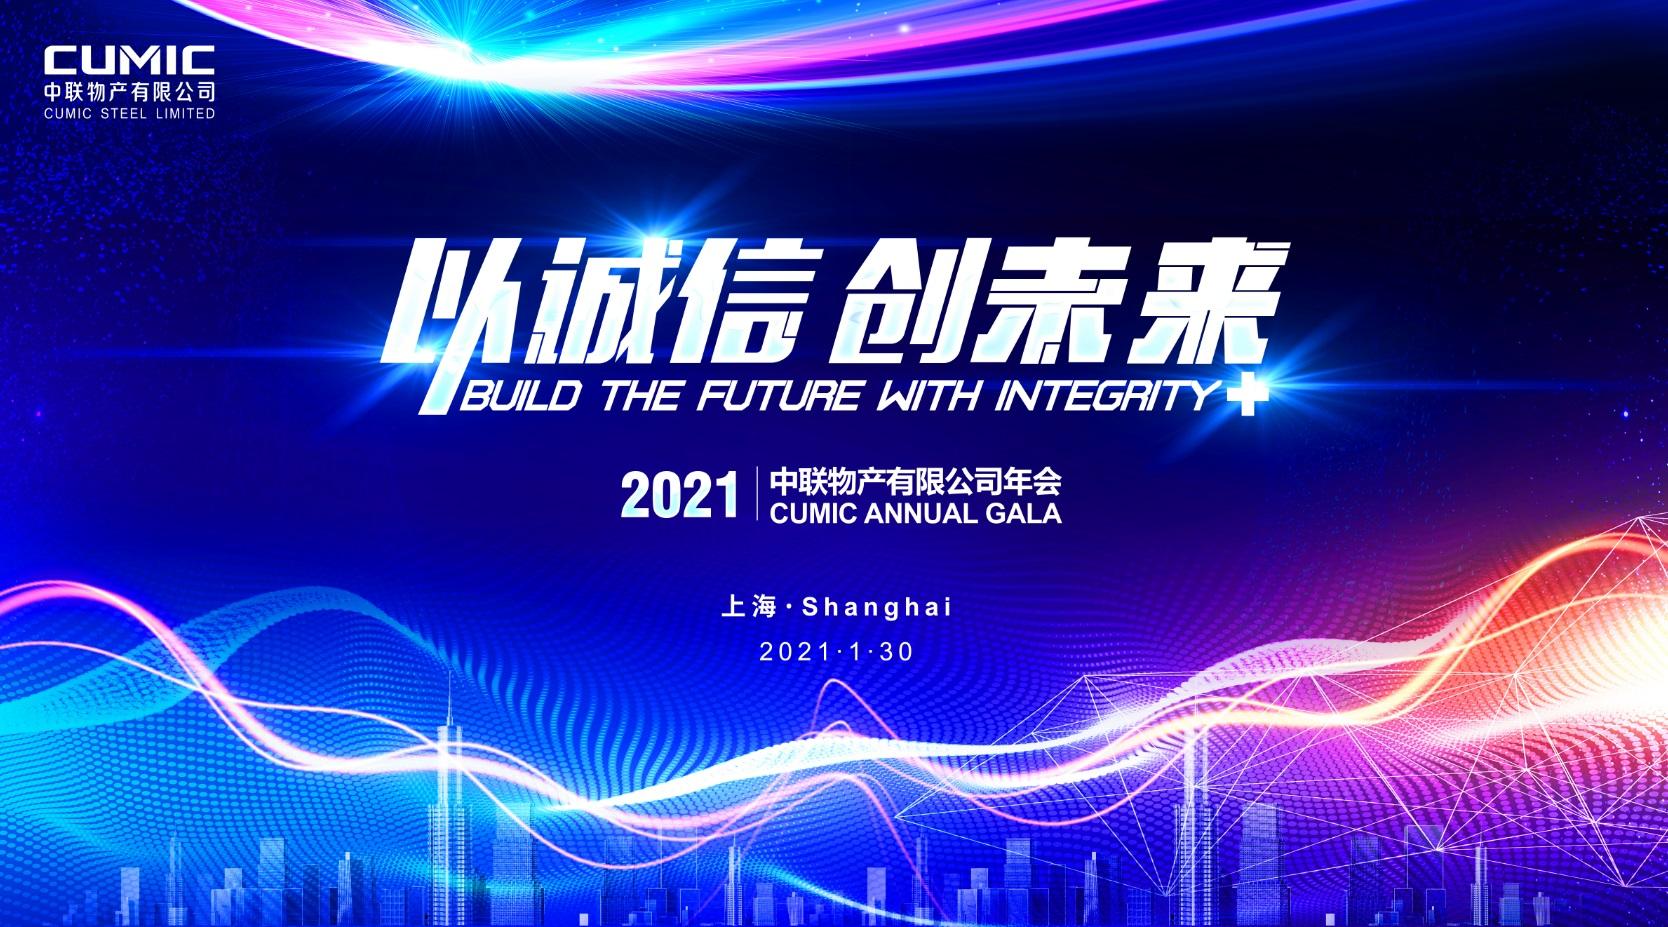 2021 CUMIC Annual Gala: Build the Future with Integrity+